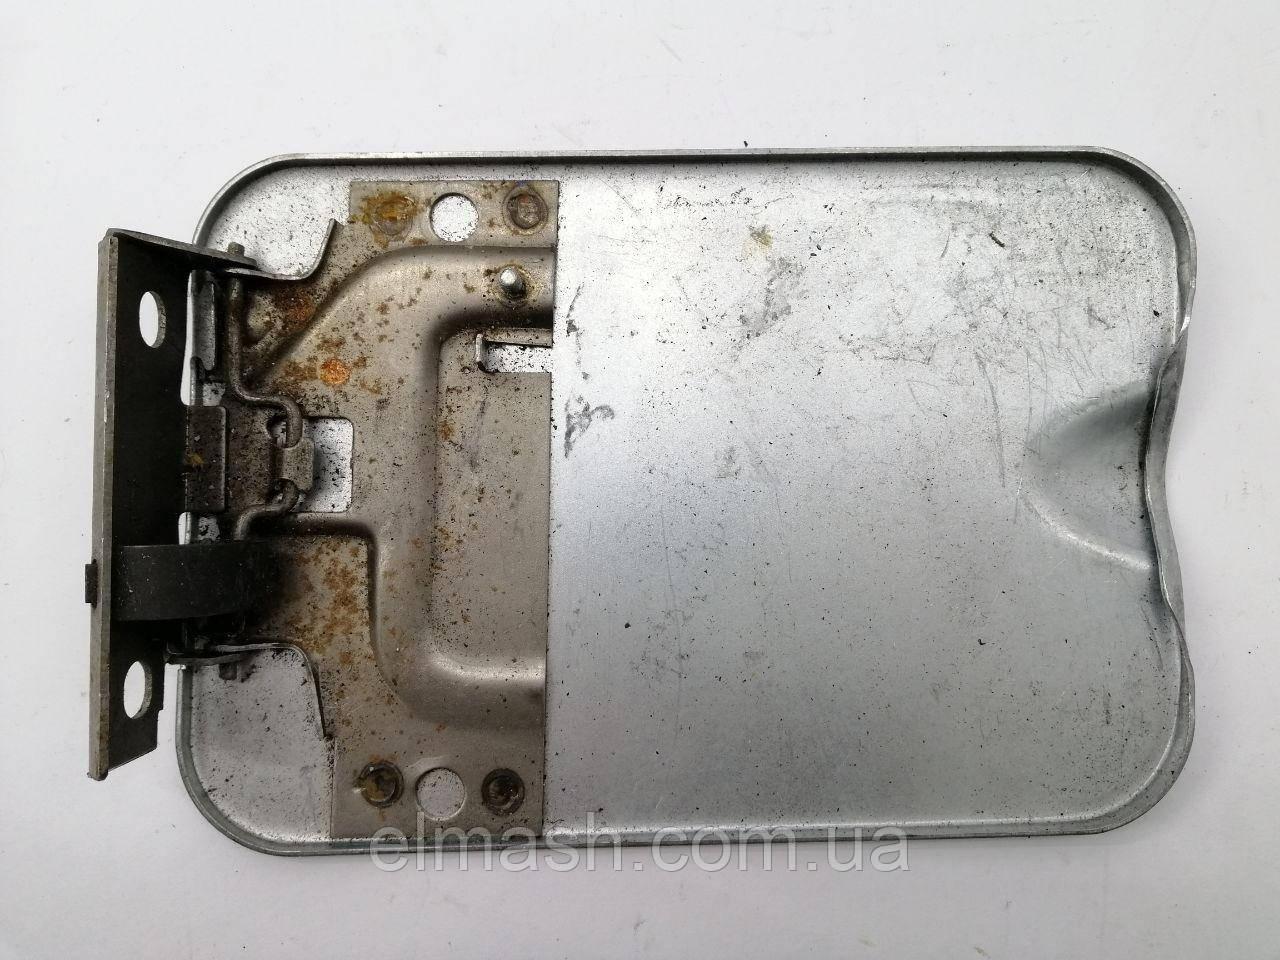 Крышка люка бензобака ВАЗ 2110 (пр-во Тольятти)